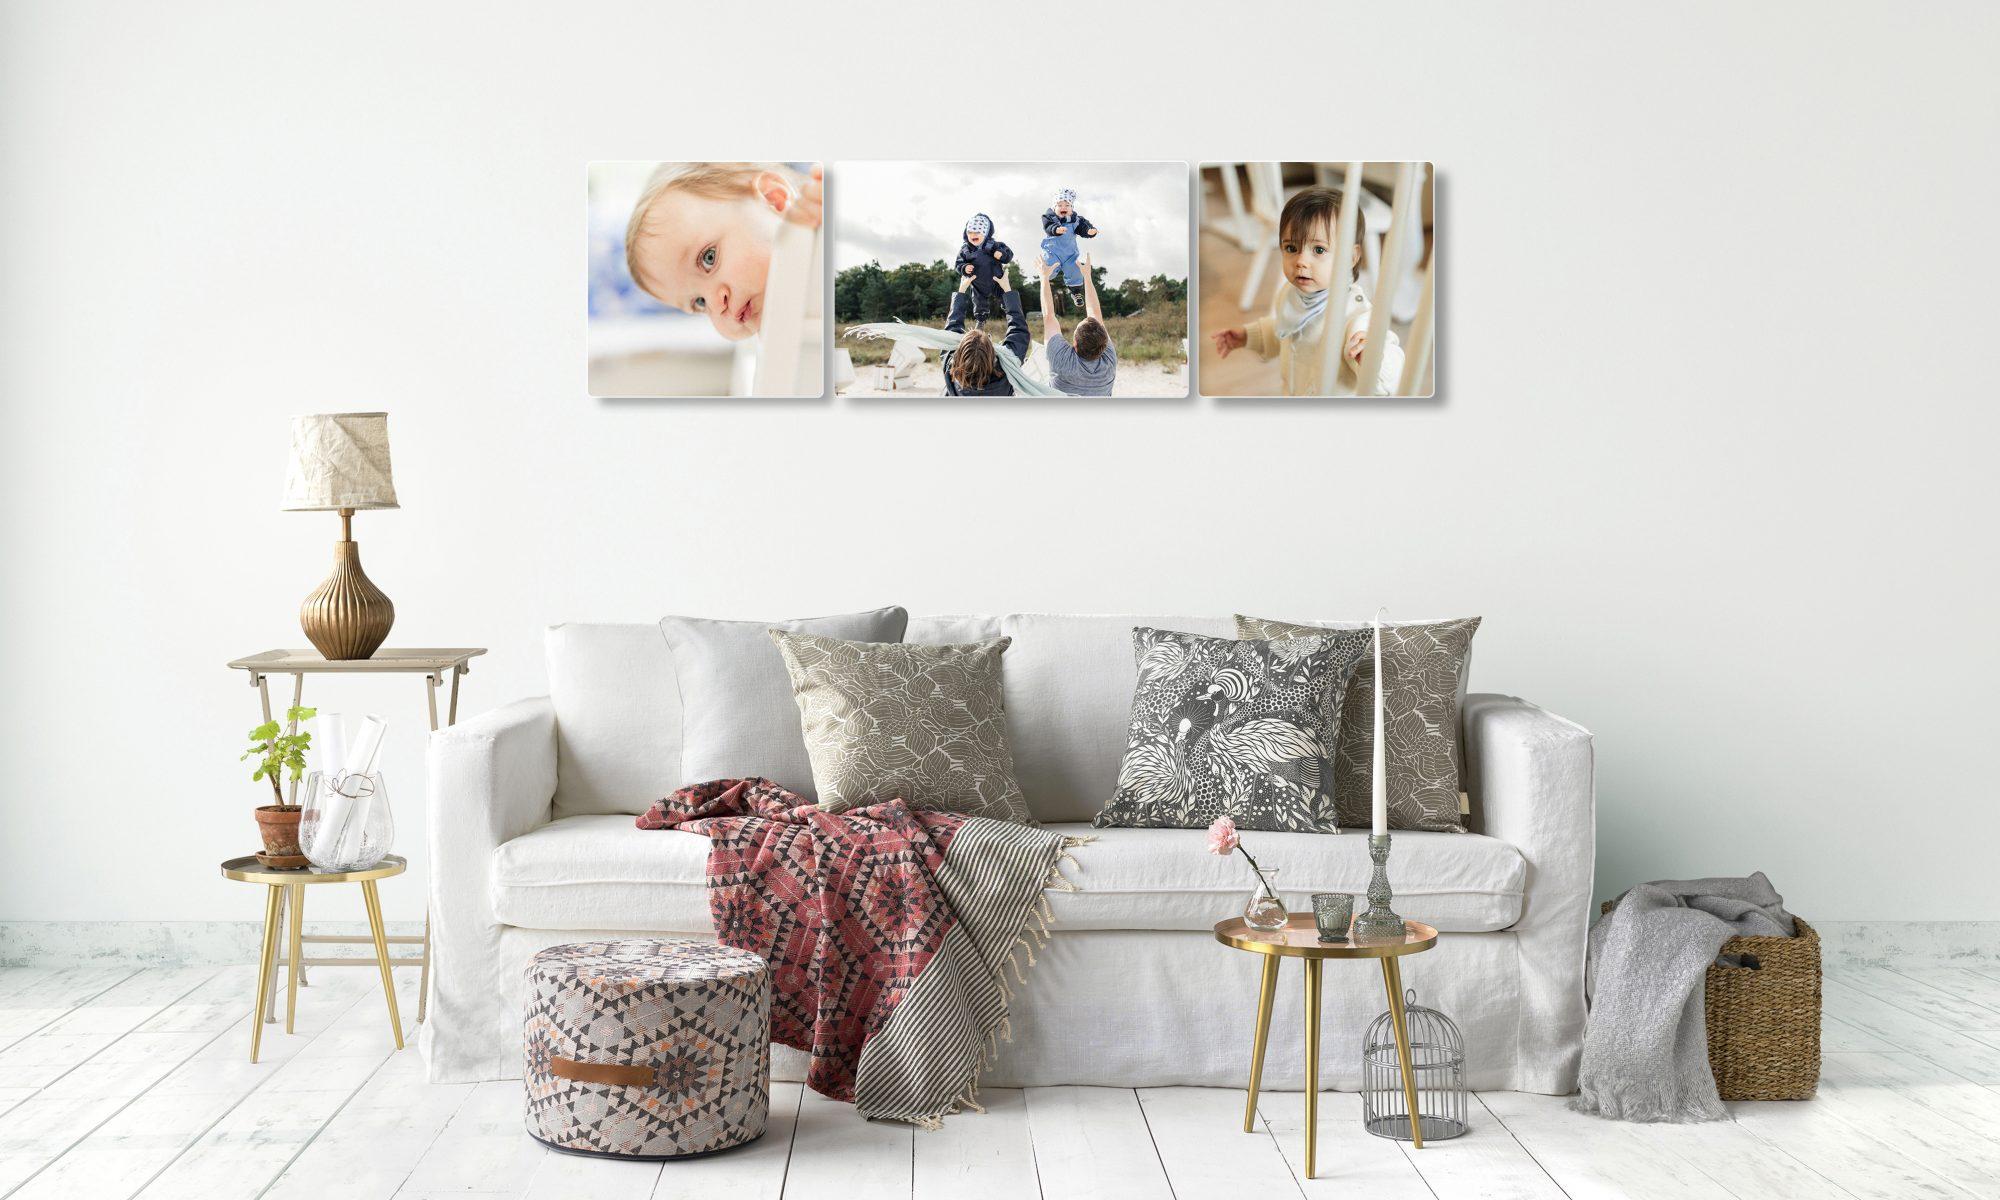 photogenio, anke schmidt, fotograf rostock, familienbild, familienfoto1